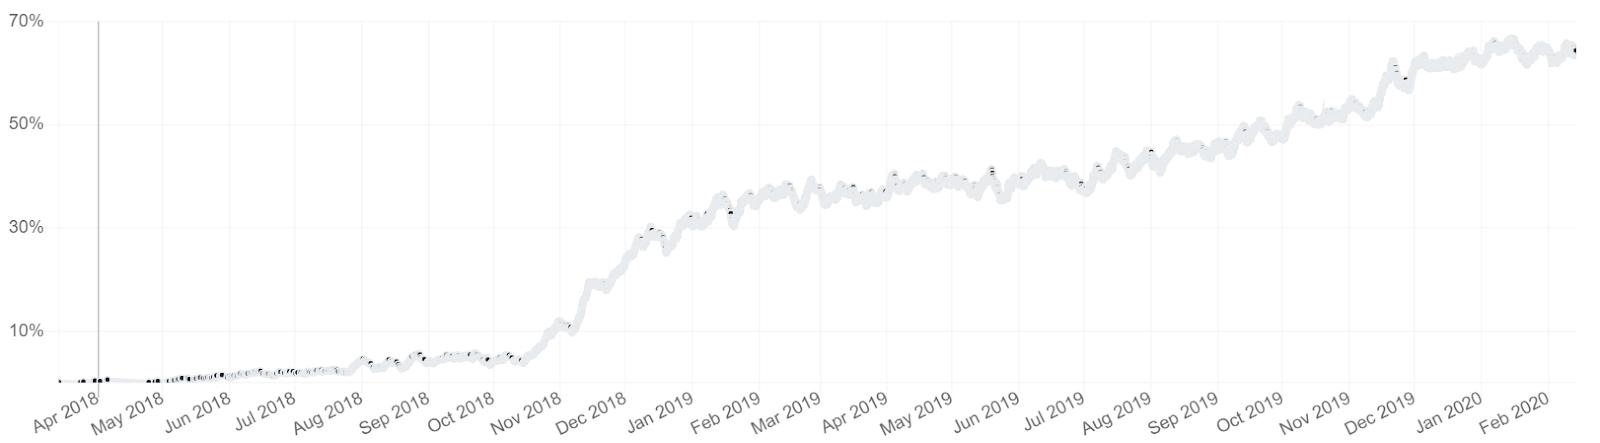 Bitcoin Price Analysis 14 Feb 2020 (4)